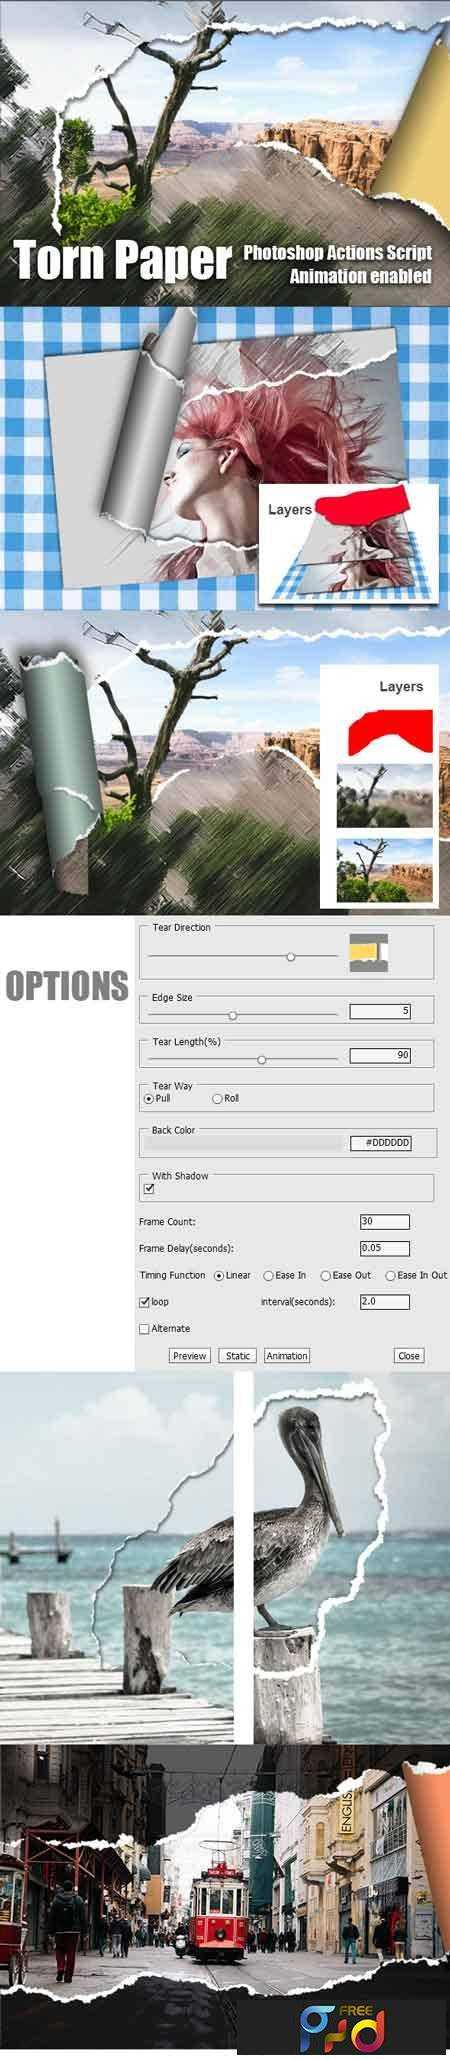 FreePsdVn.com_1705192_PHOTOSHOP_torn_paper_animation_photoshop_add-on_20572901